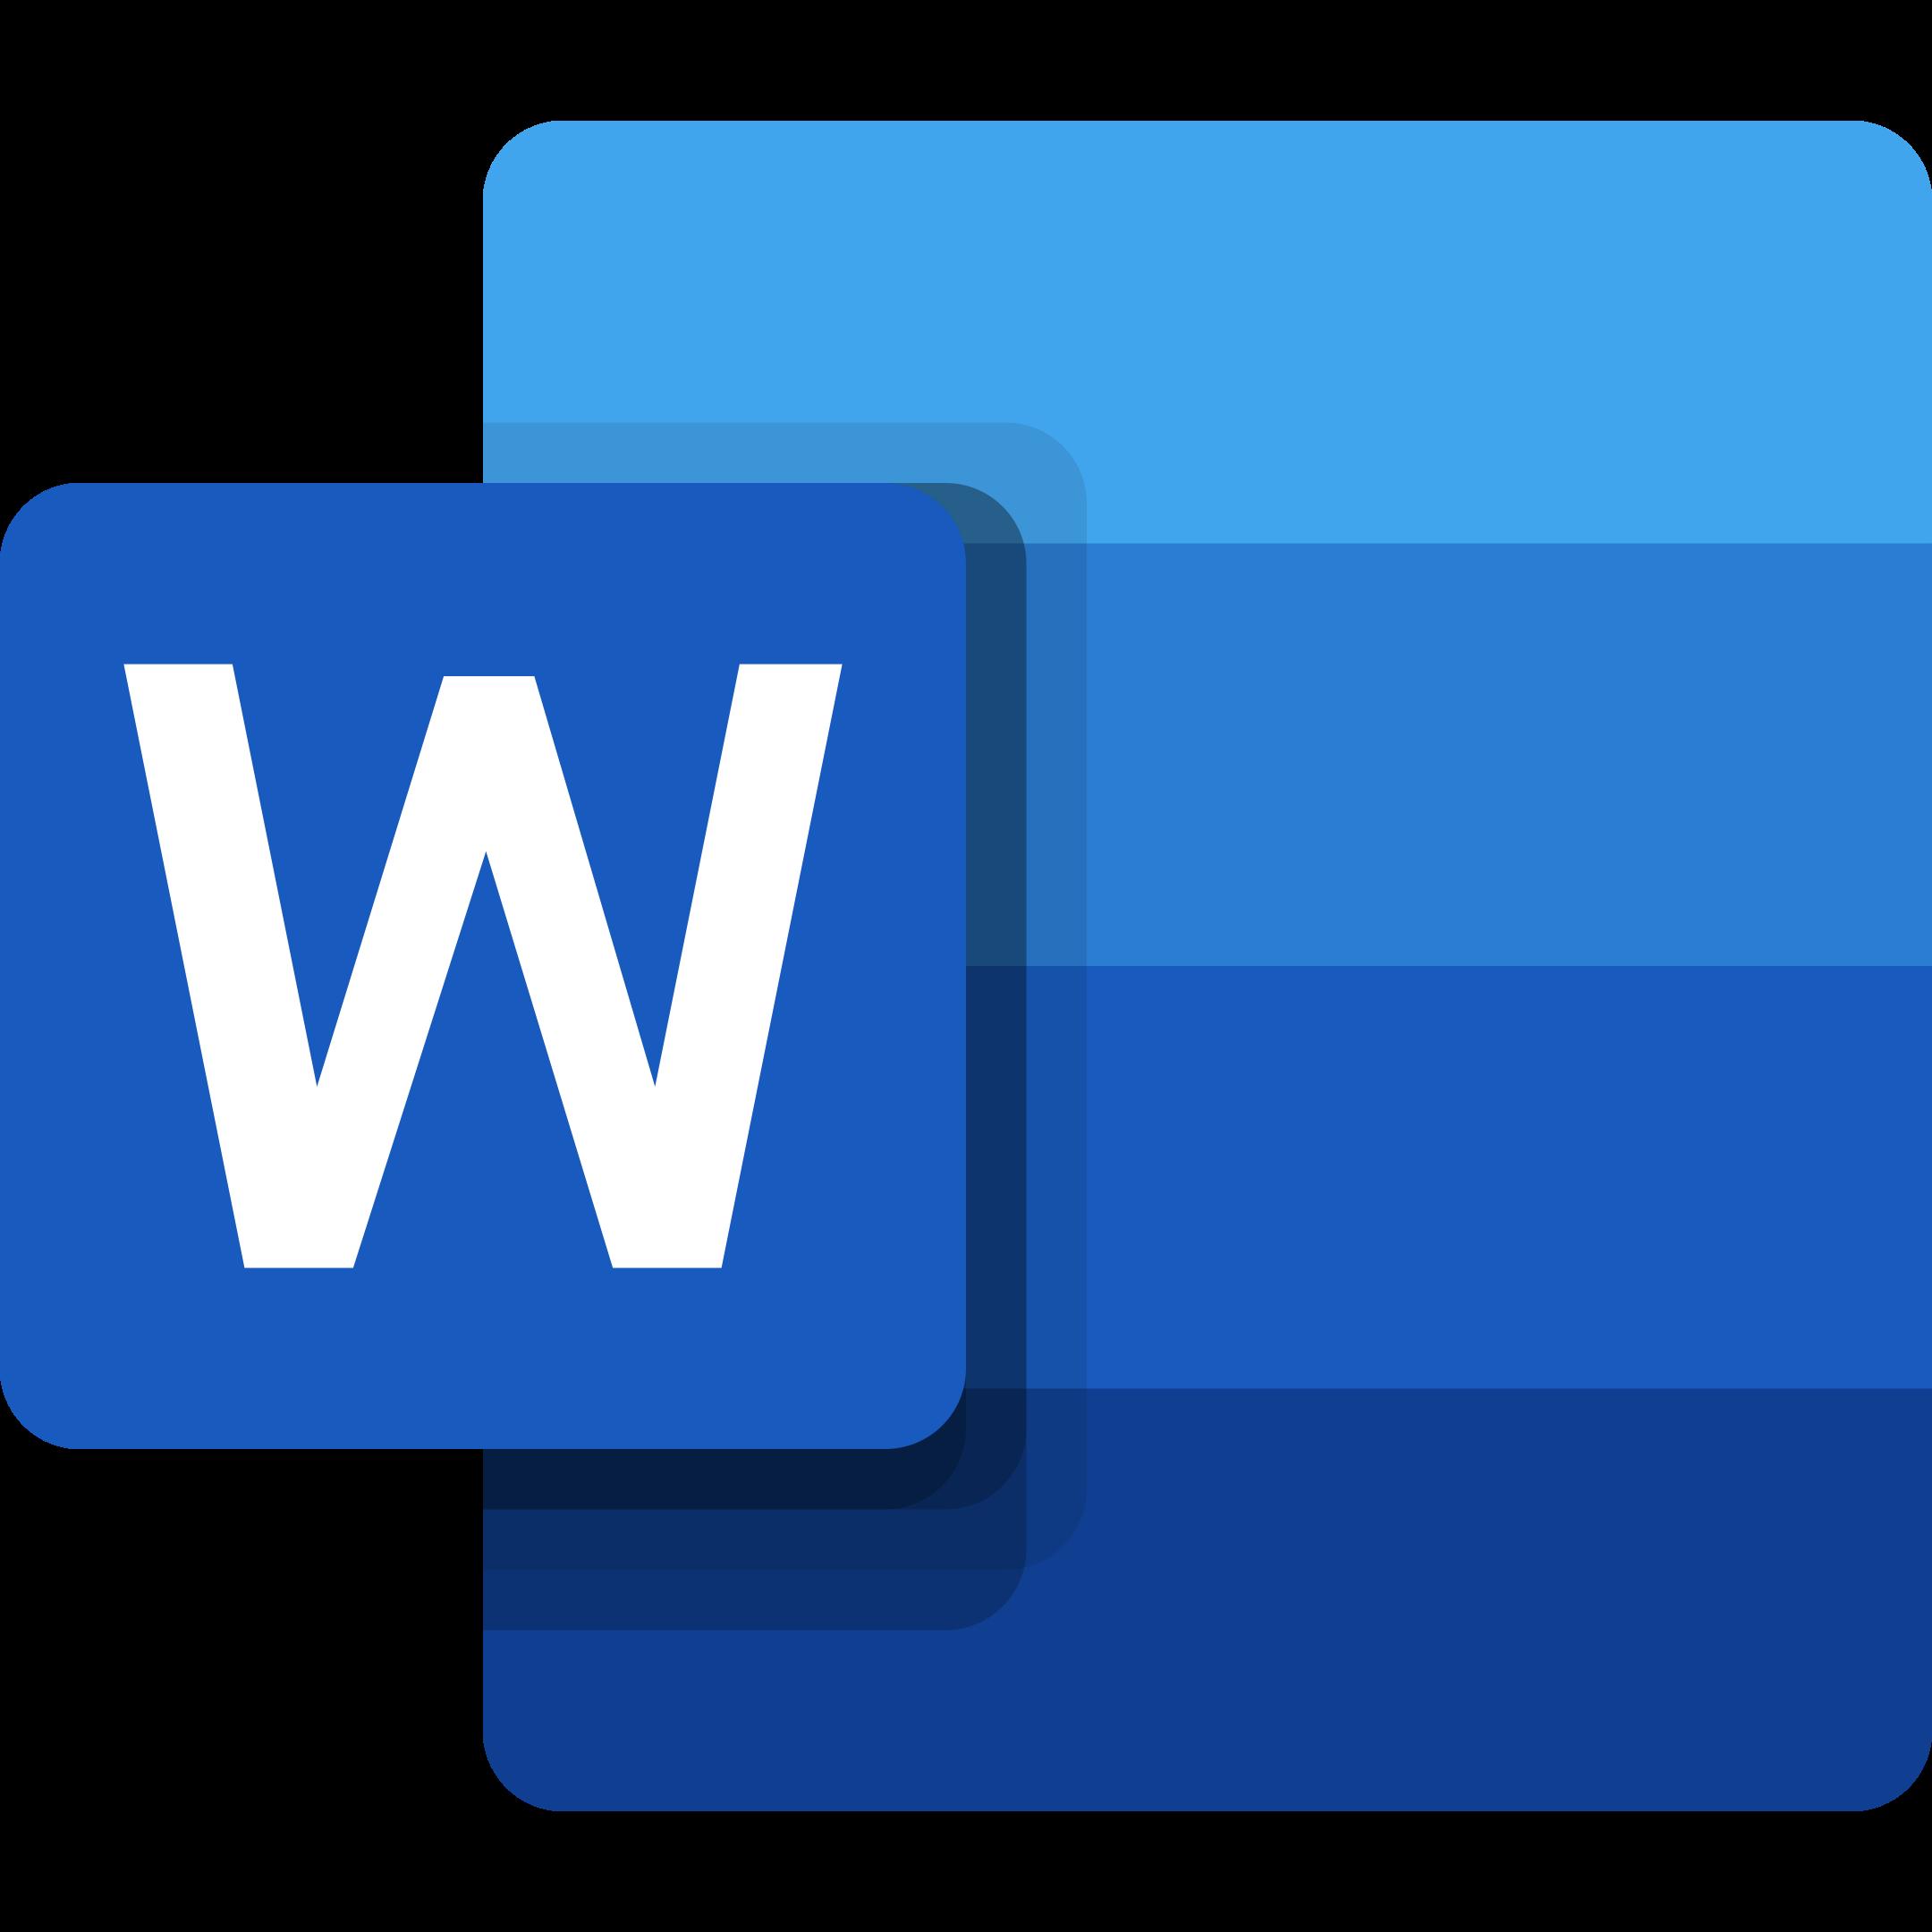 word logo 1 1 - Microsoft Word Logo